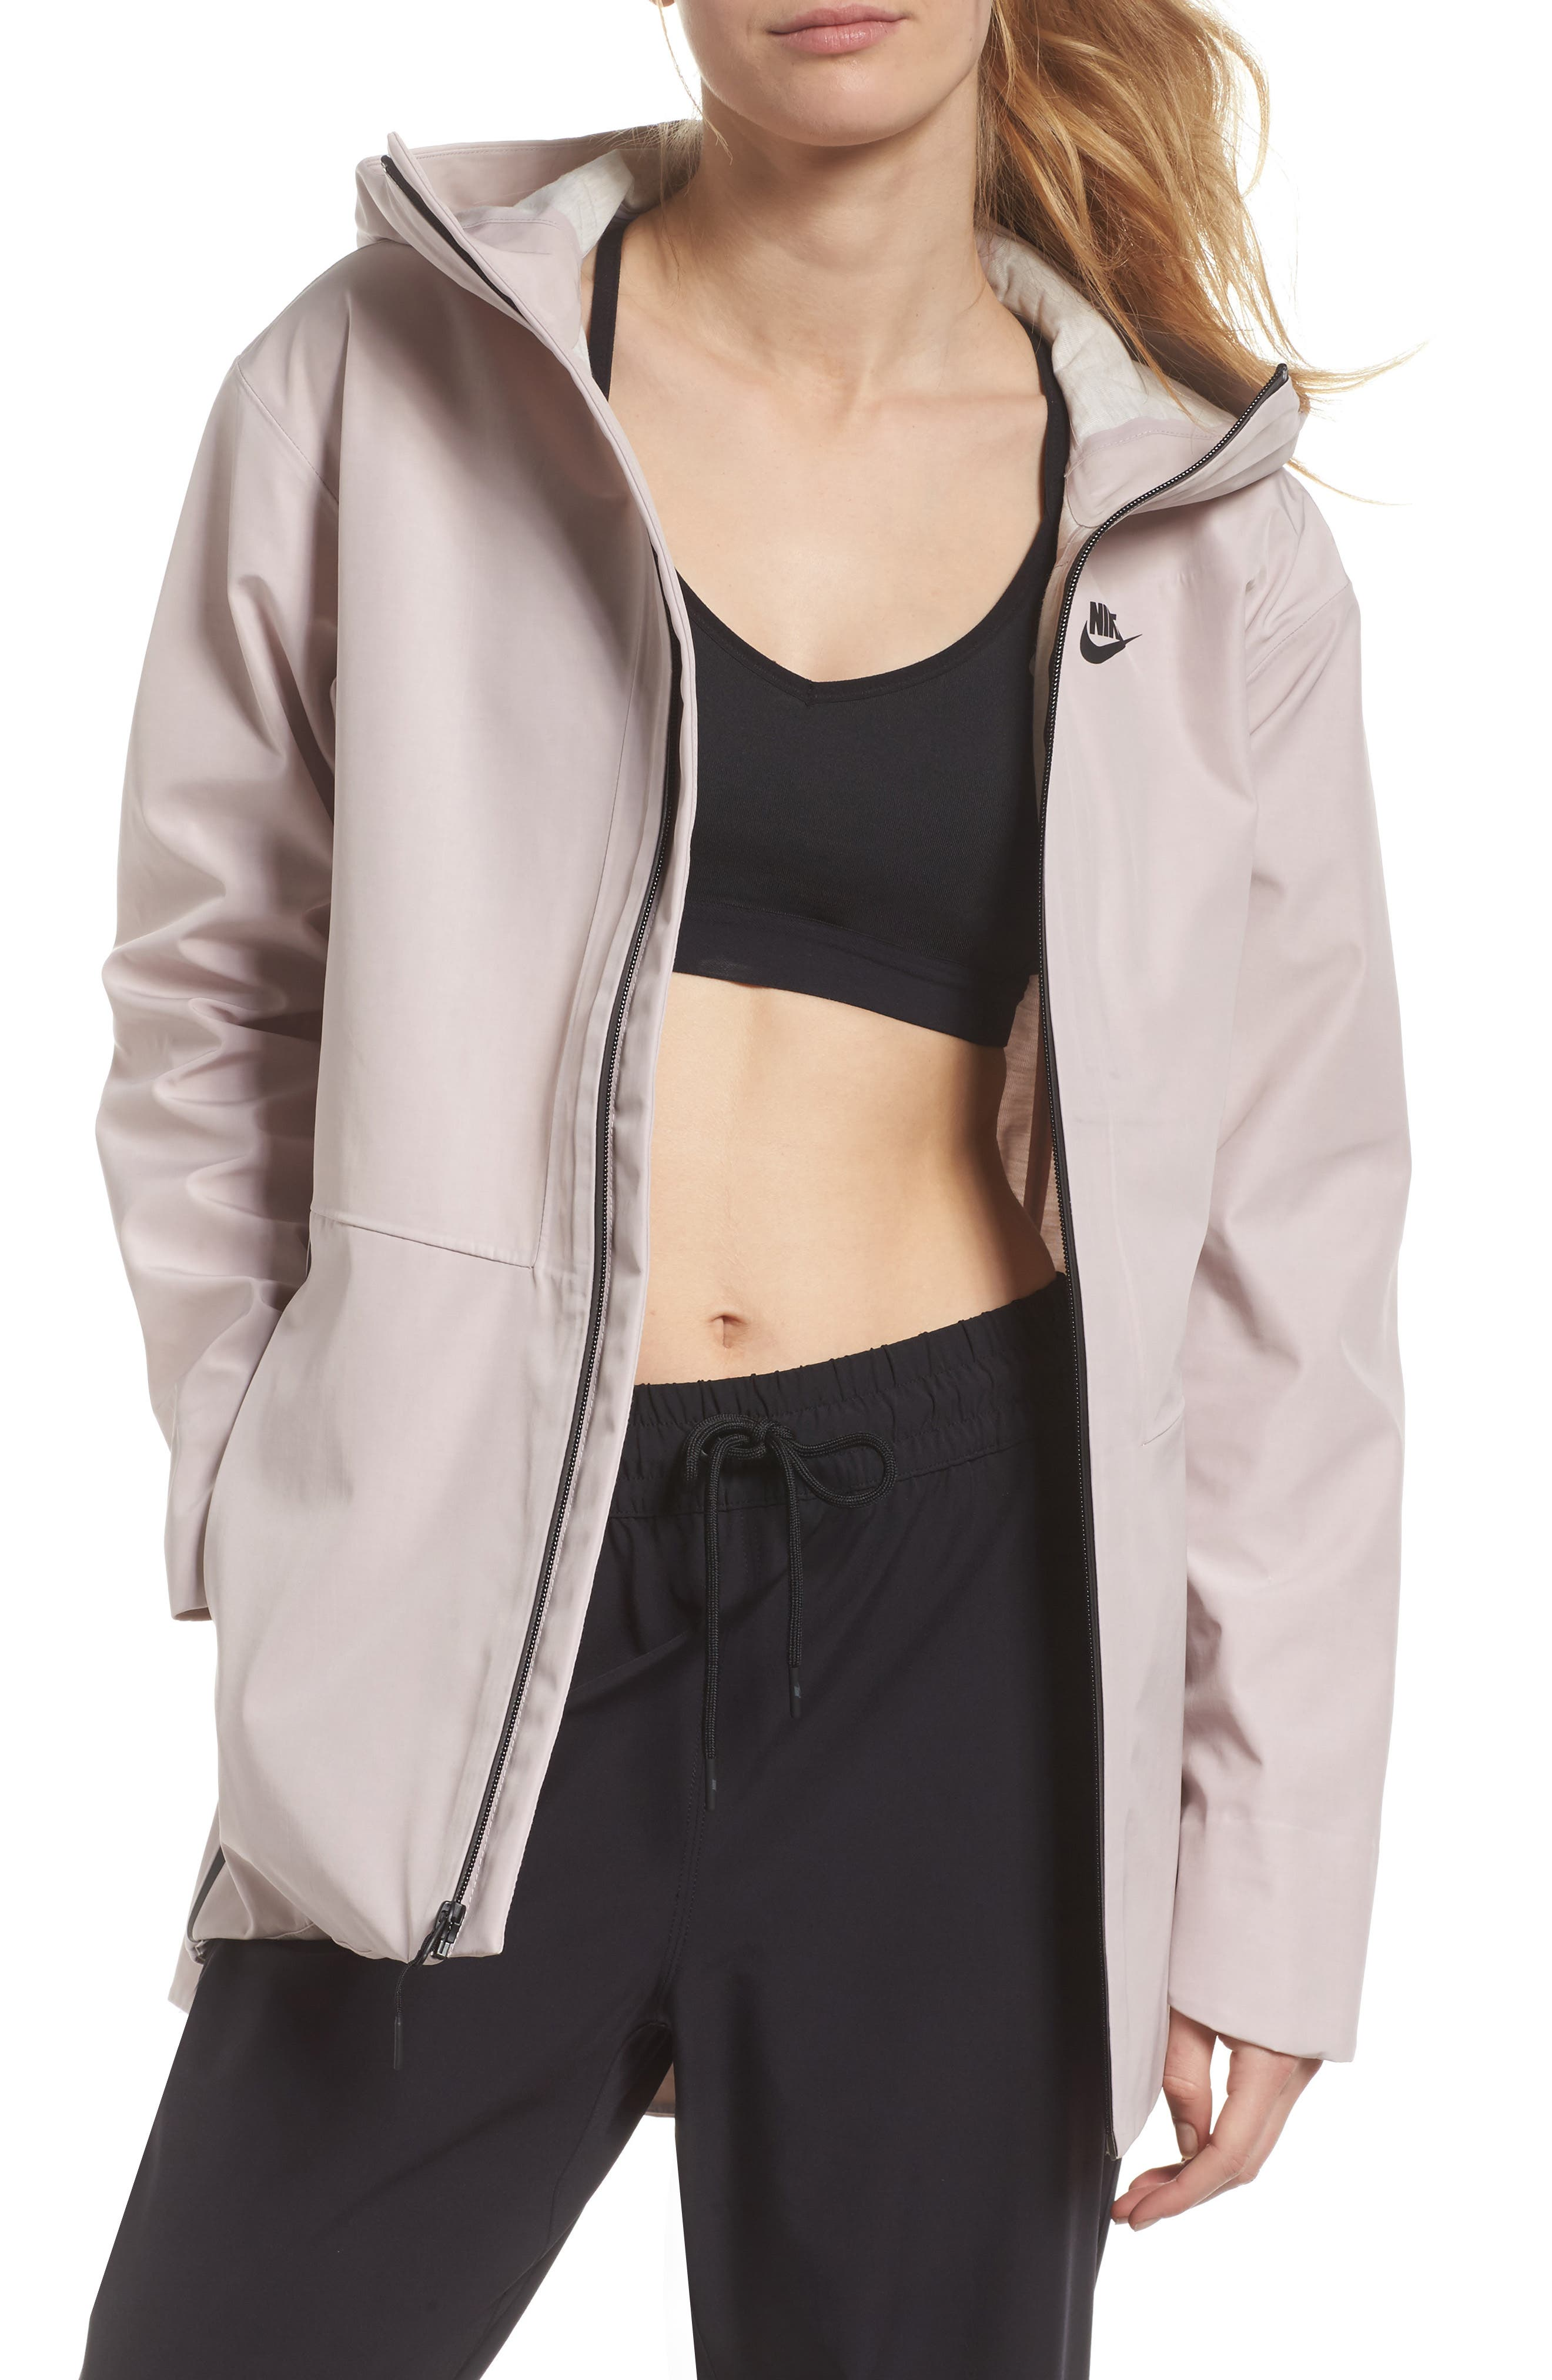 Sportswear Women's Tech Jacket,                             Main thumbnail 1, color,                             Particle Rose/ Black